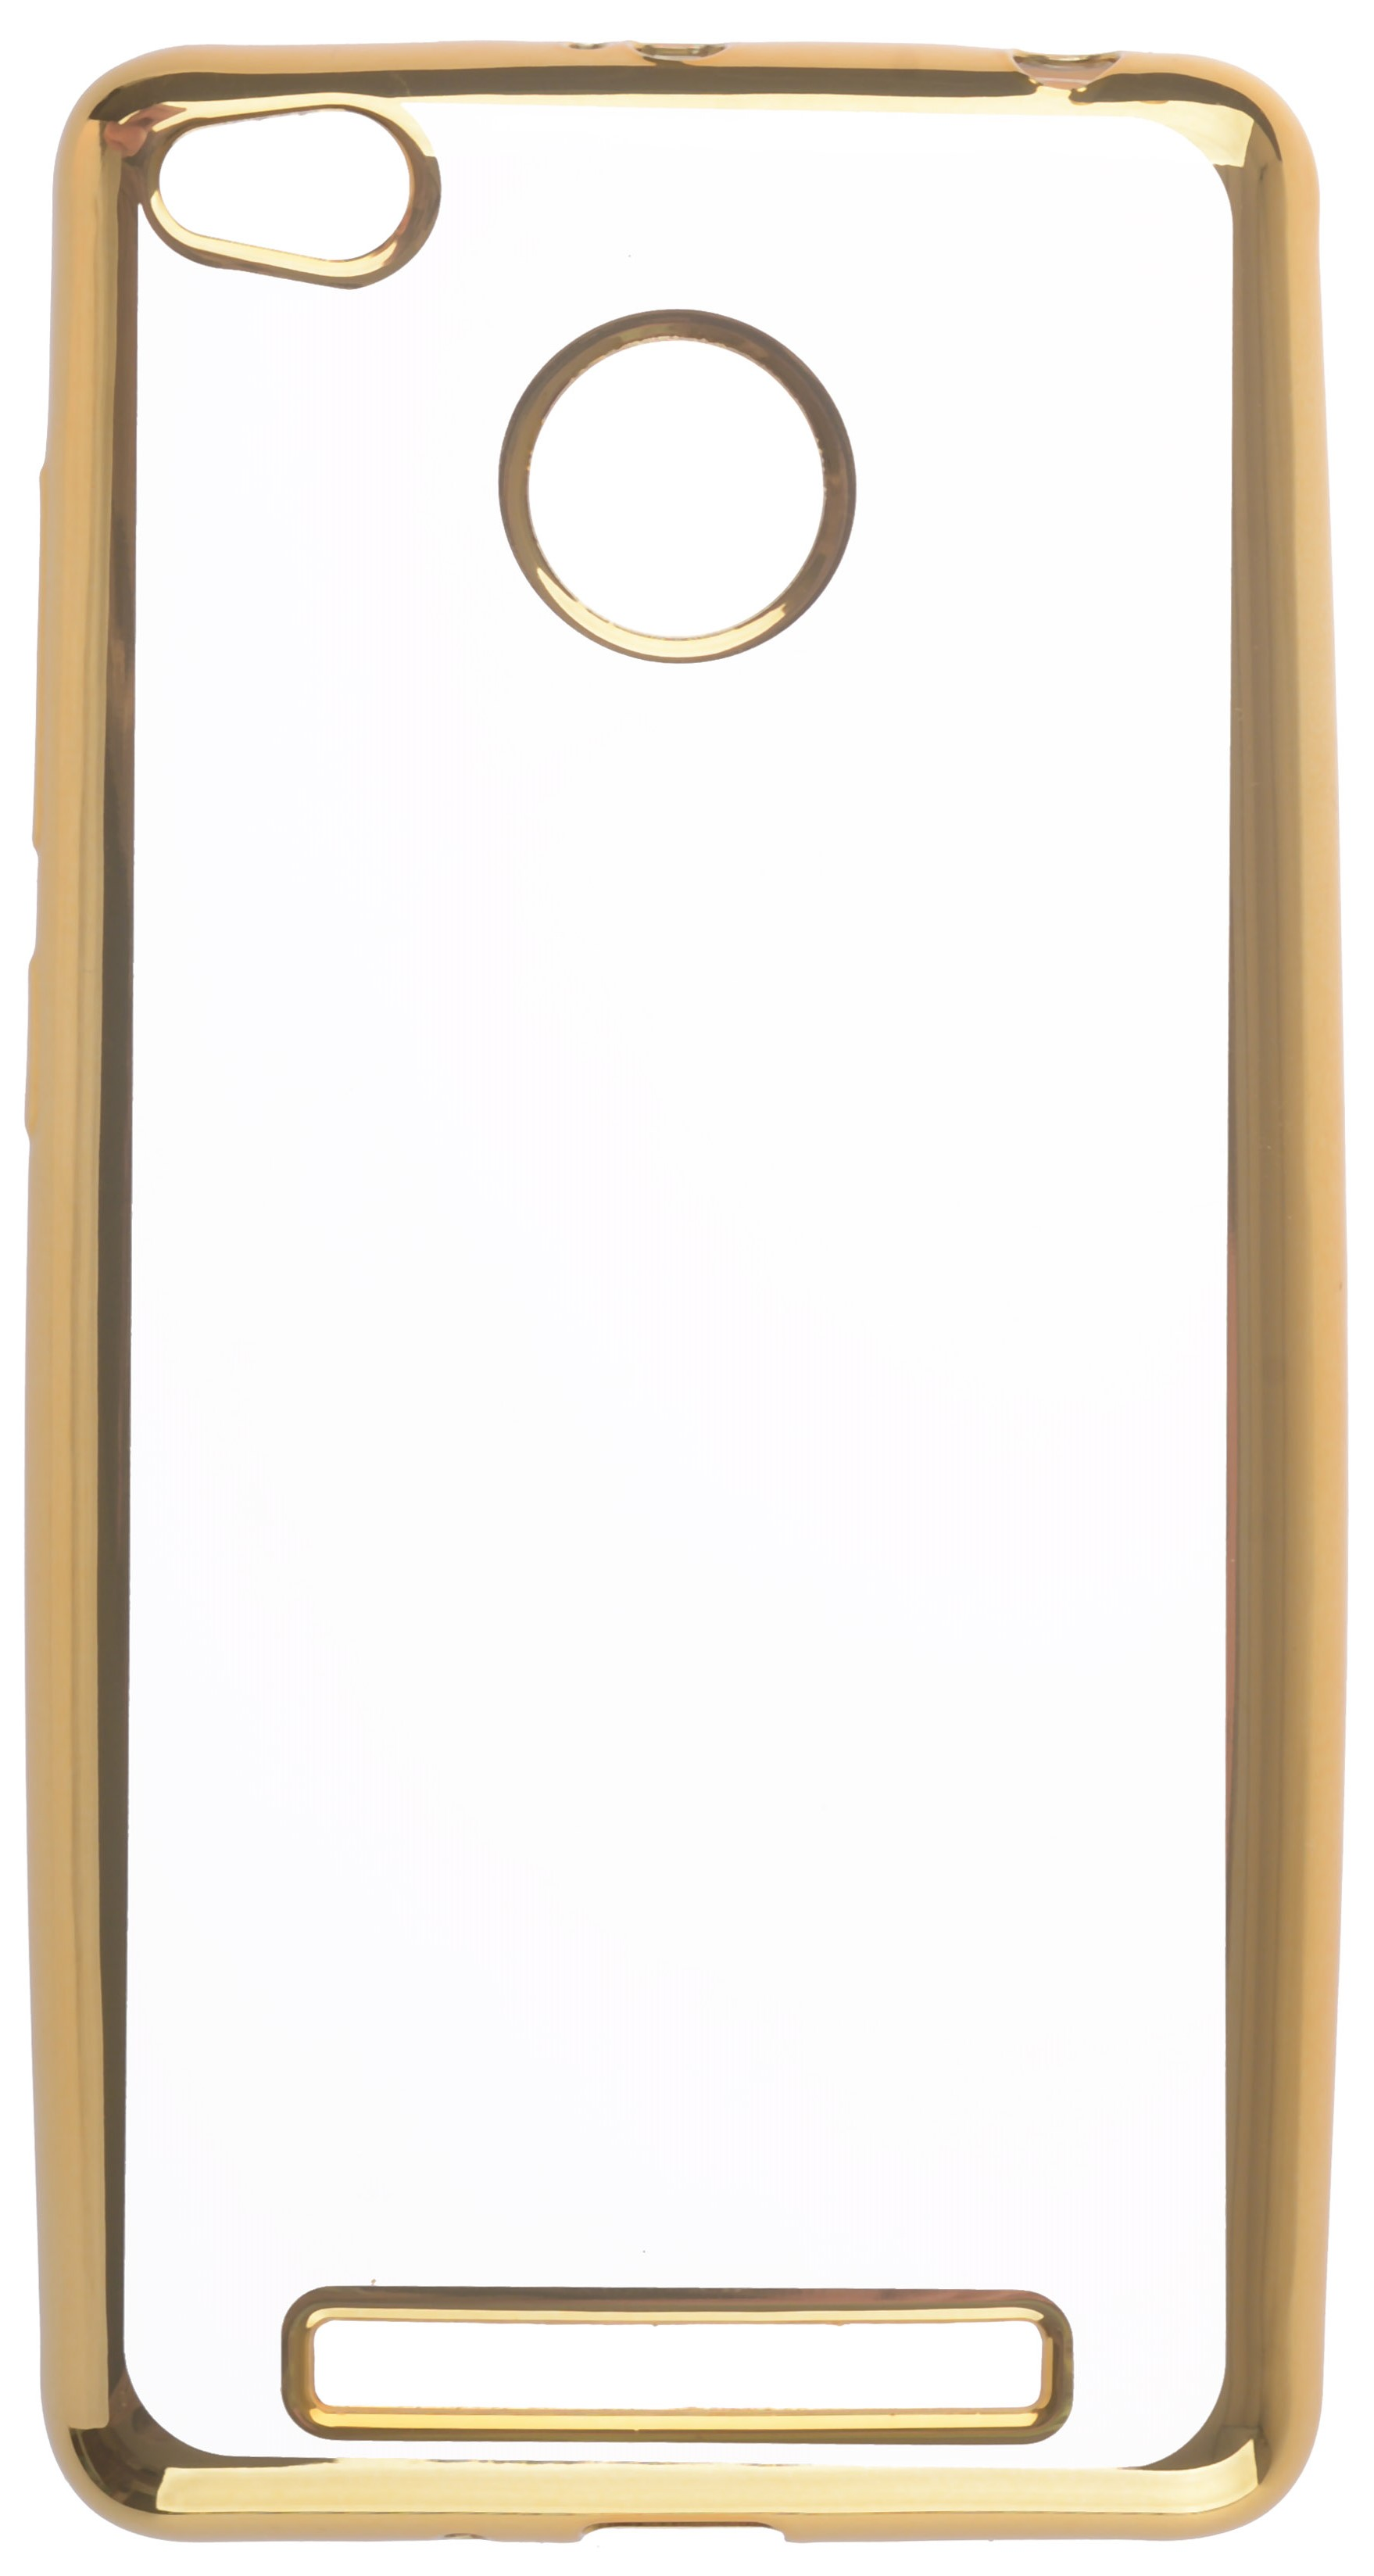 Чехол для сотового телефона skinBOX Silicone chrome border, 4660041407846, золотой skinbox 4people slim silicone чехол накладка для xiaomi redmi 4a transparent